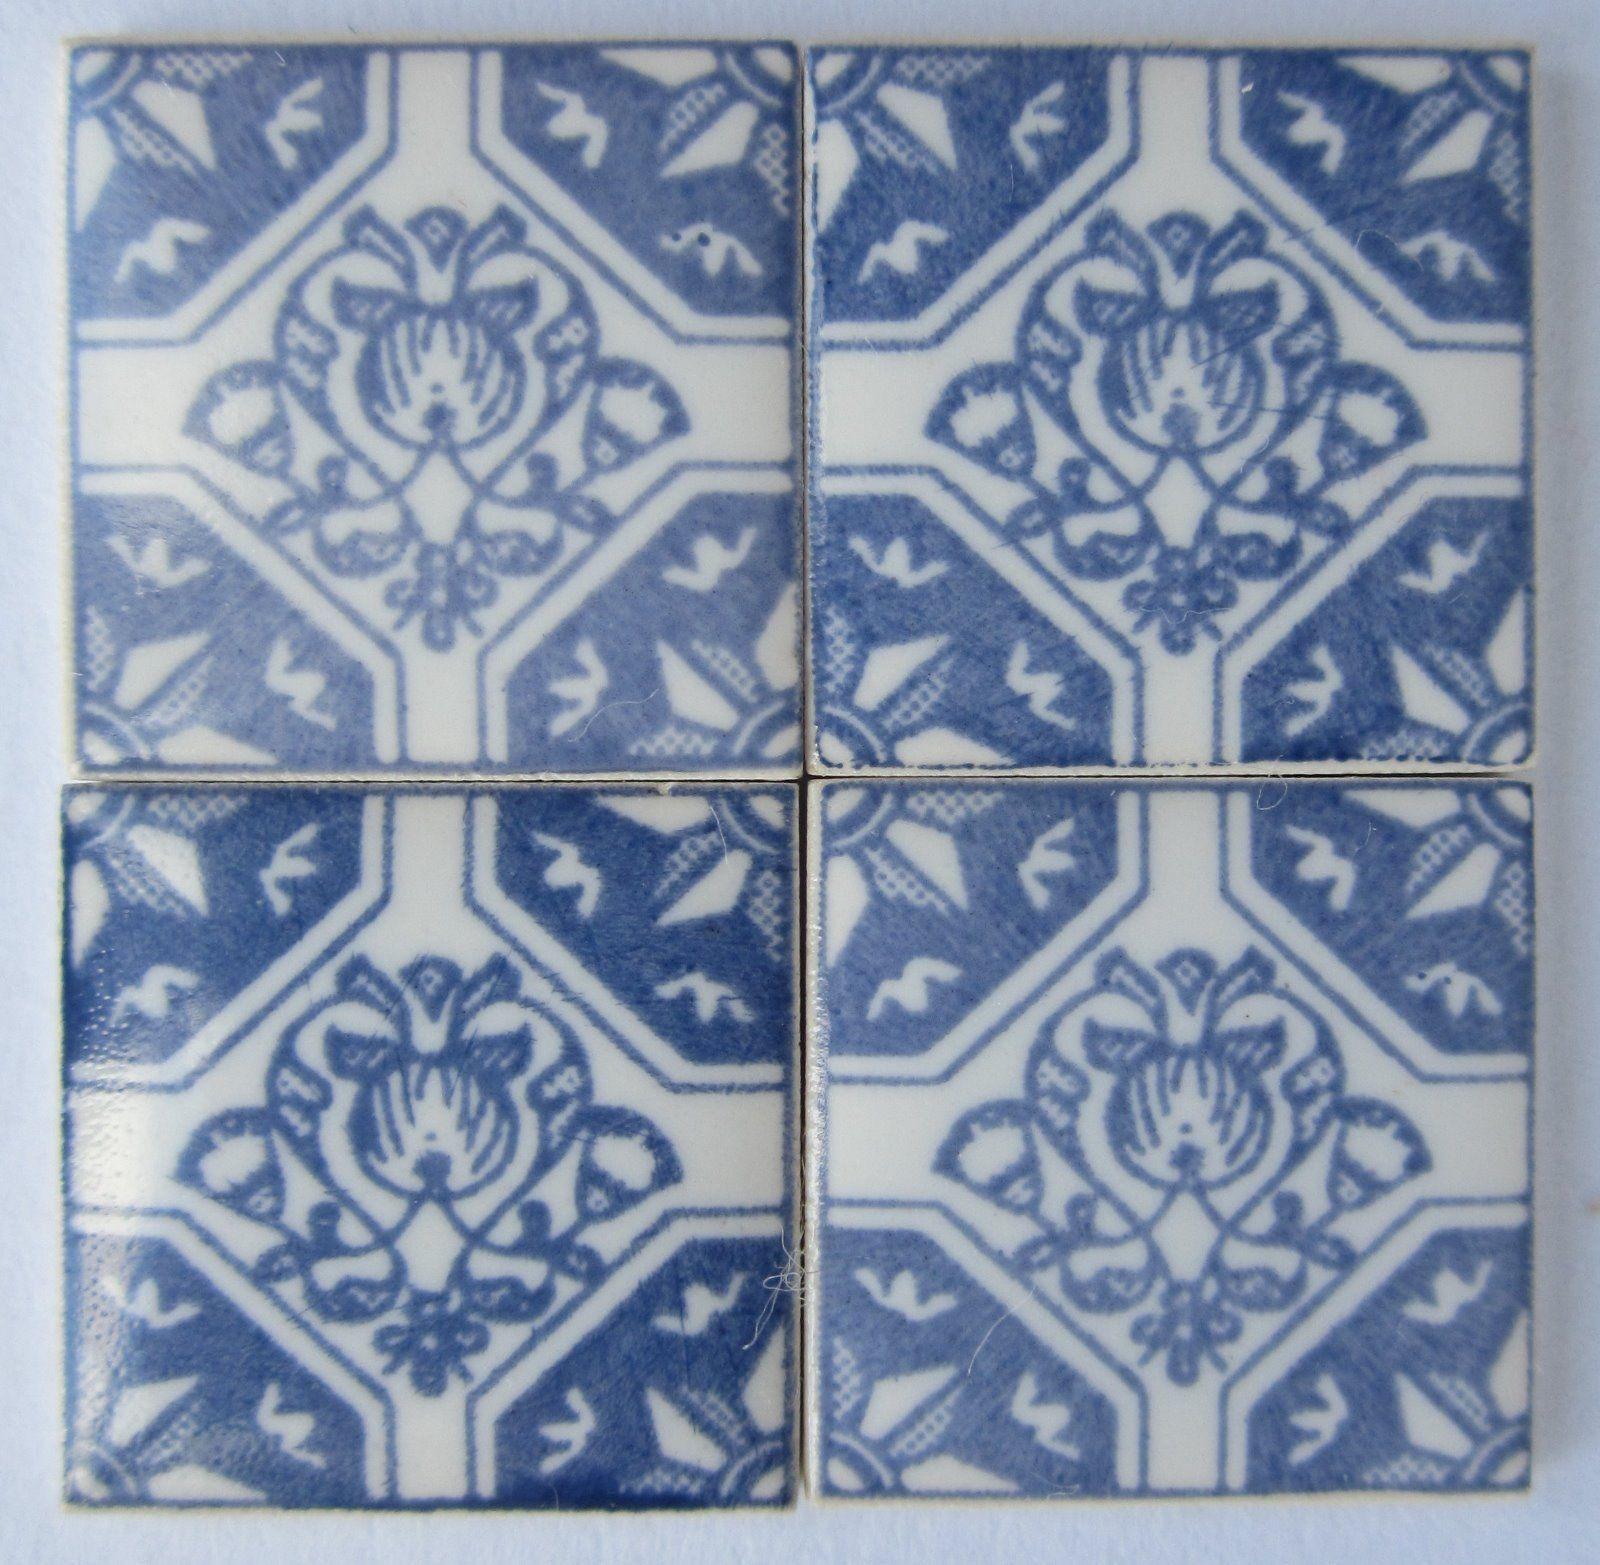 10 ceramic miniature Delft tiles byTerry Curran 1/2\